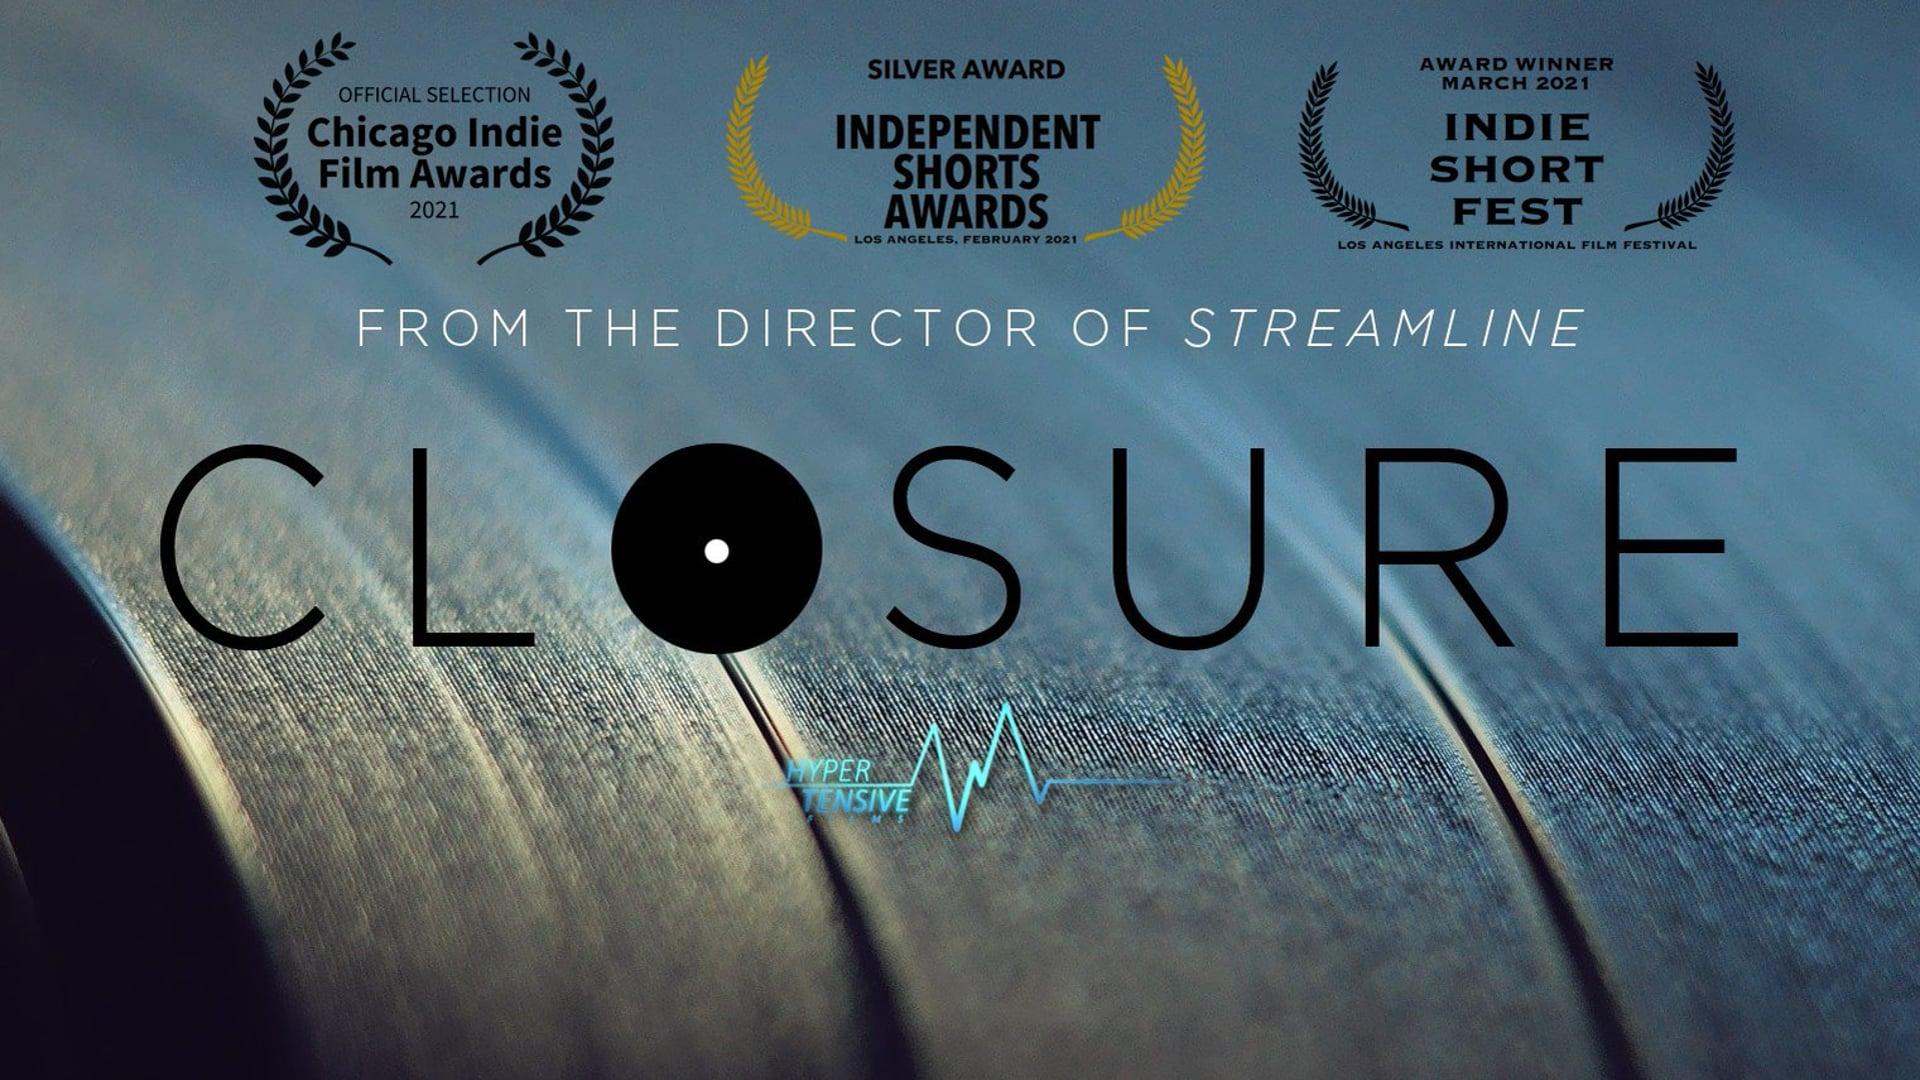 Closure - A Short Film by Dan Marcus